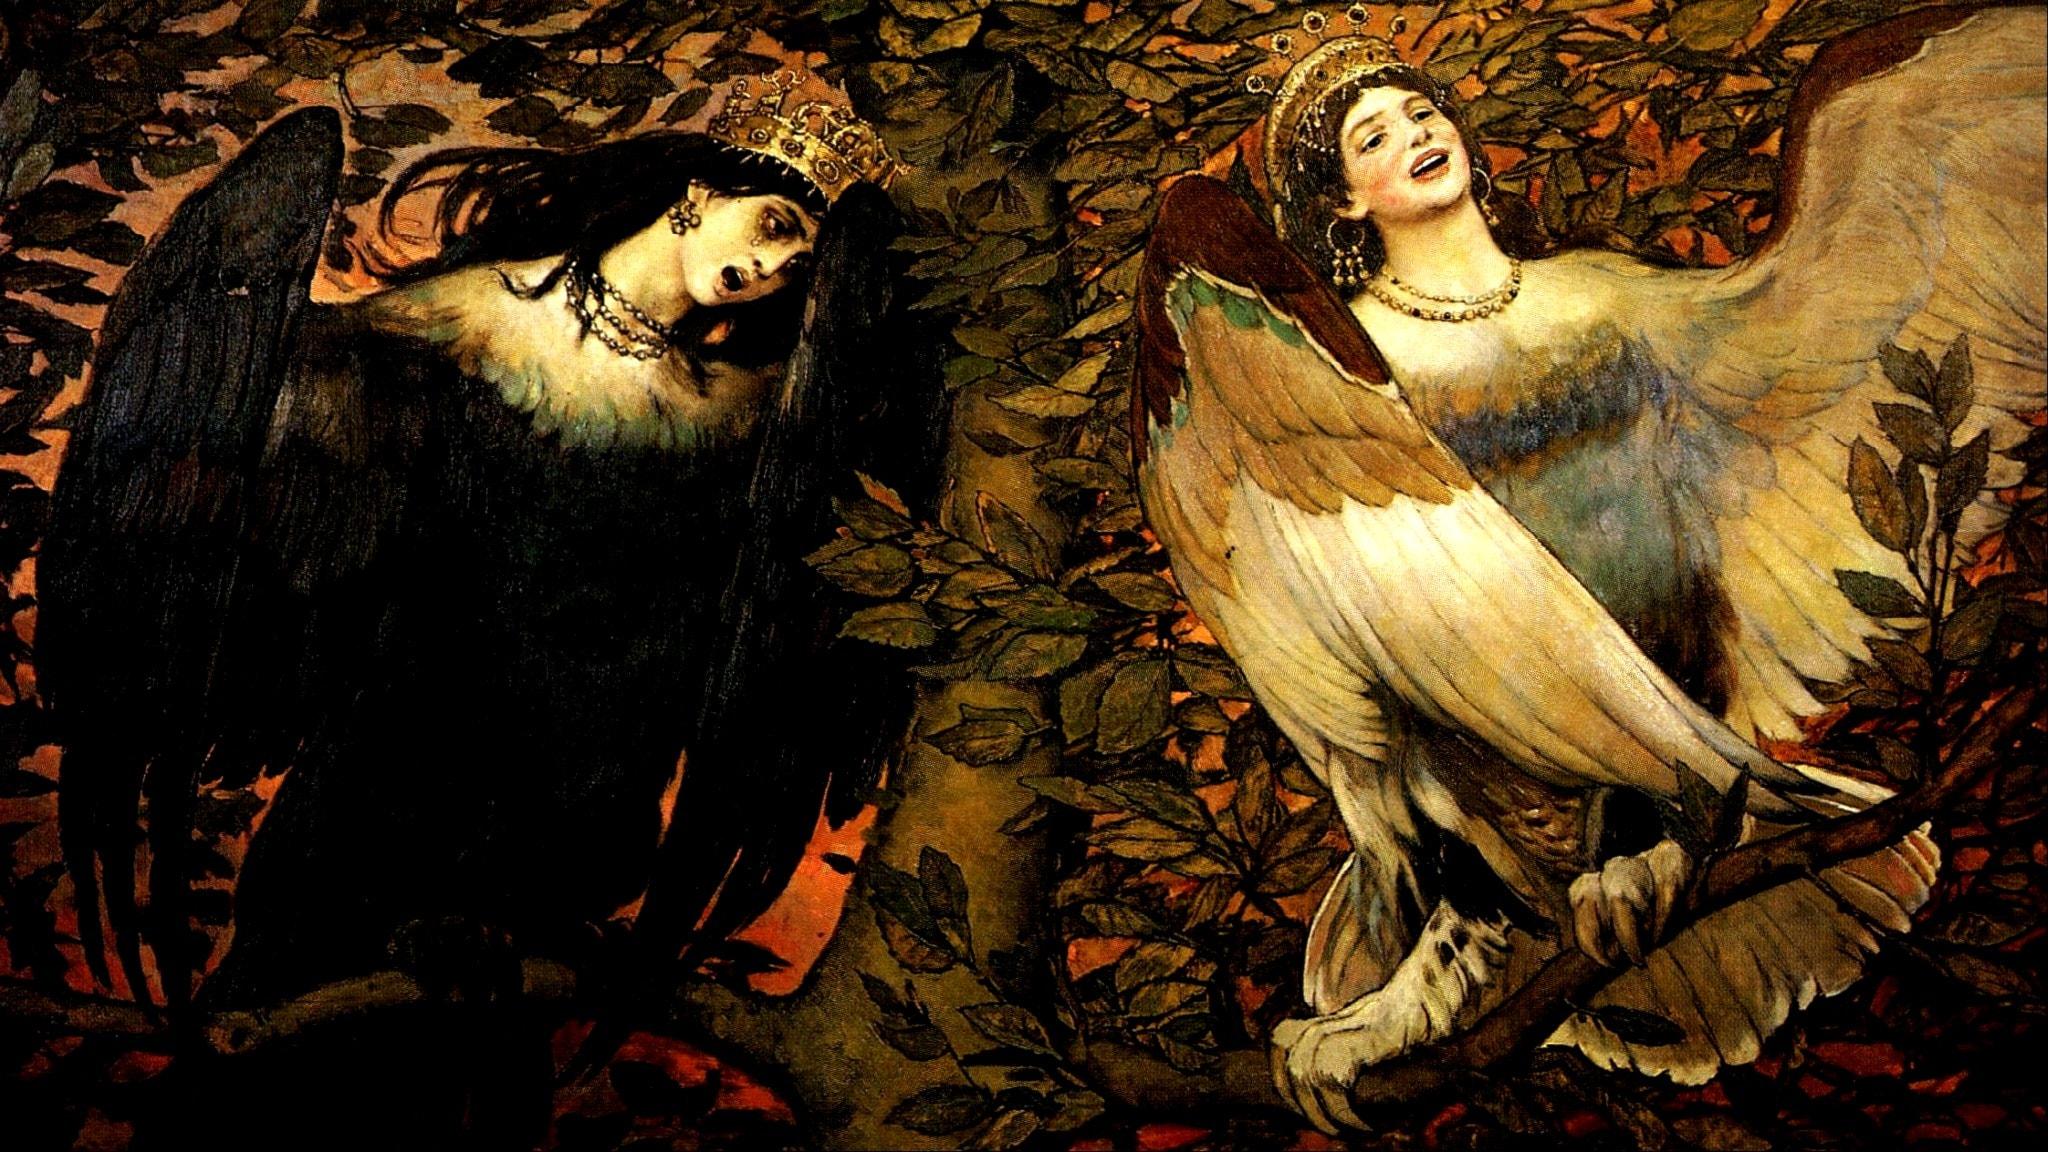 'The Birds of Joy and Sorrow'. Viktor Vasnetsov, 1896.